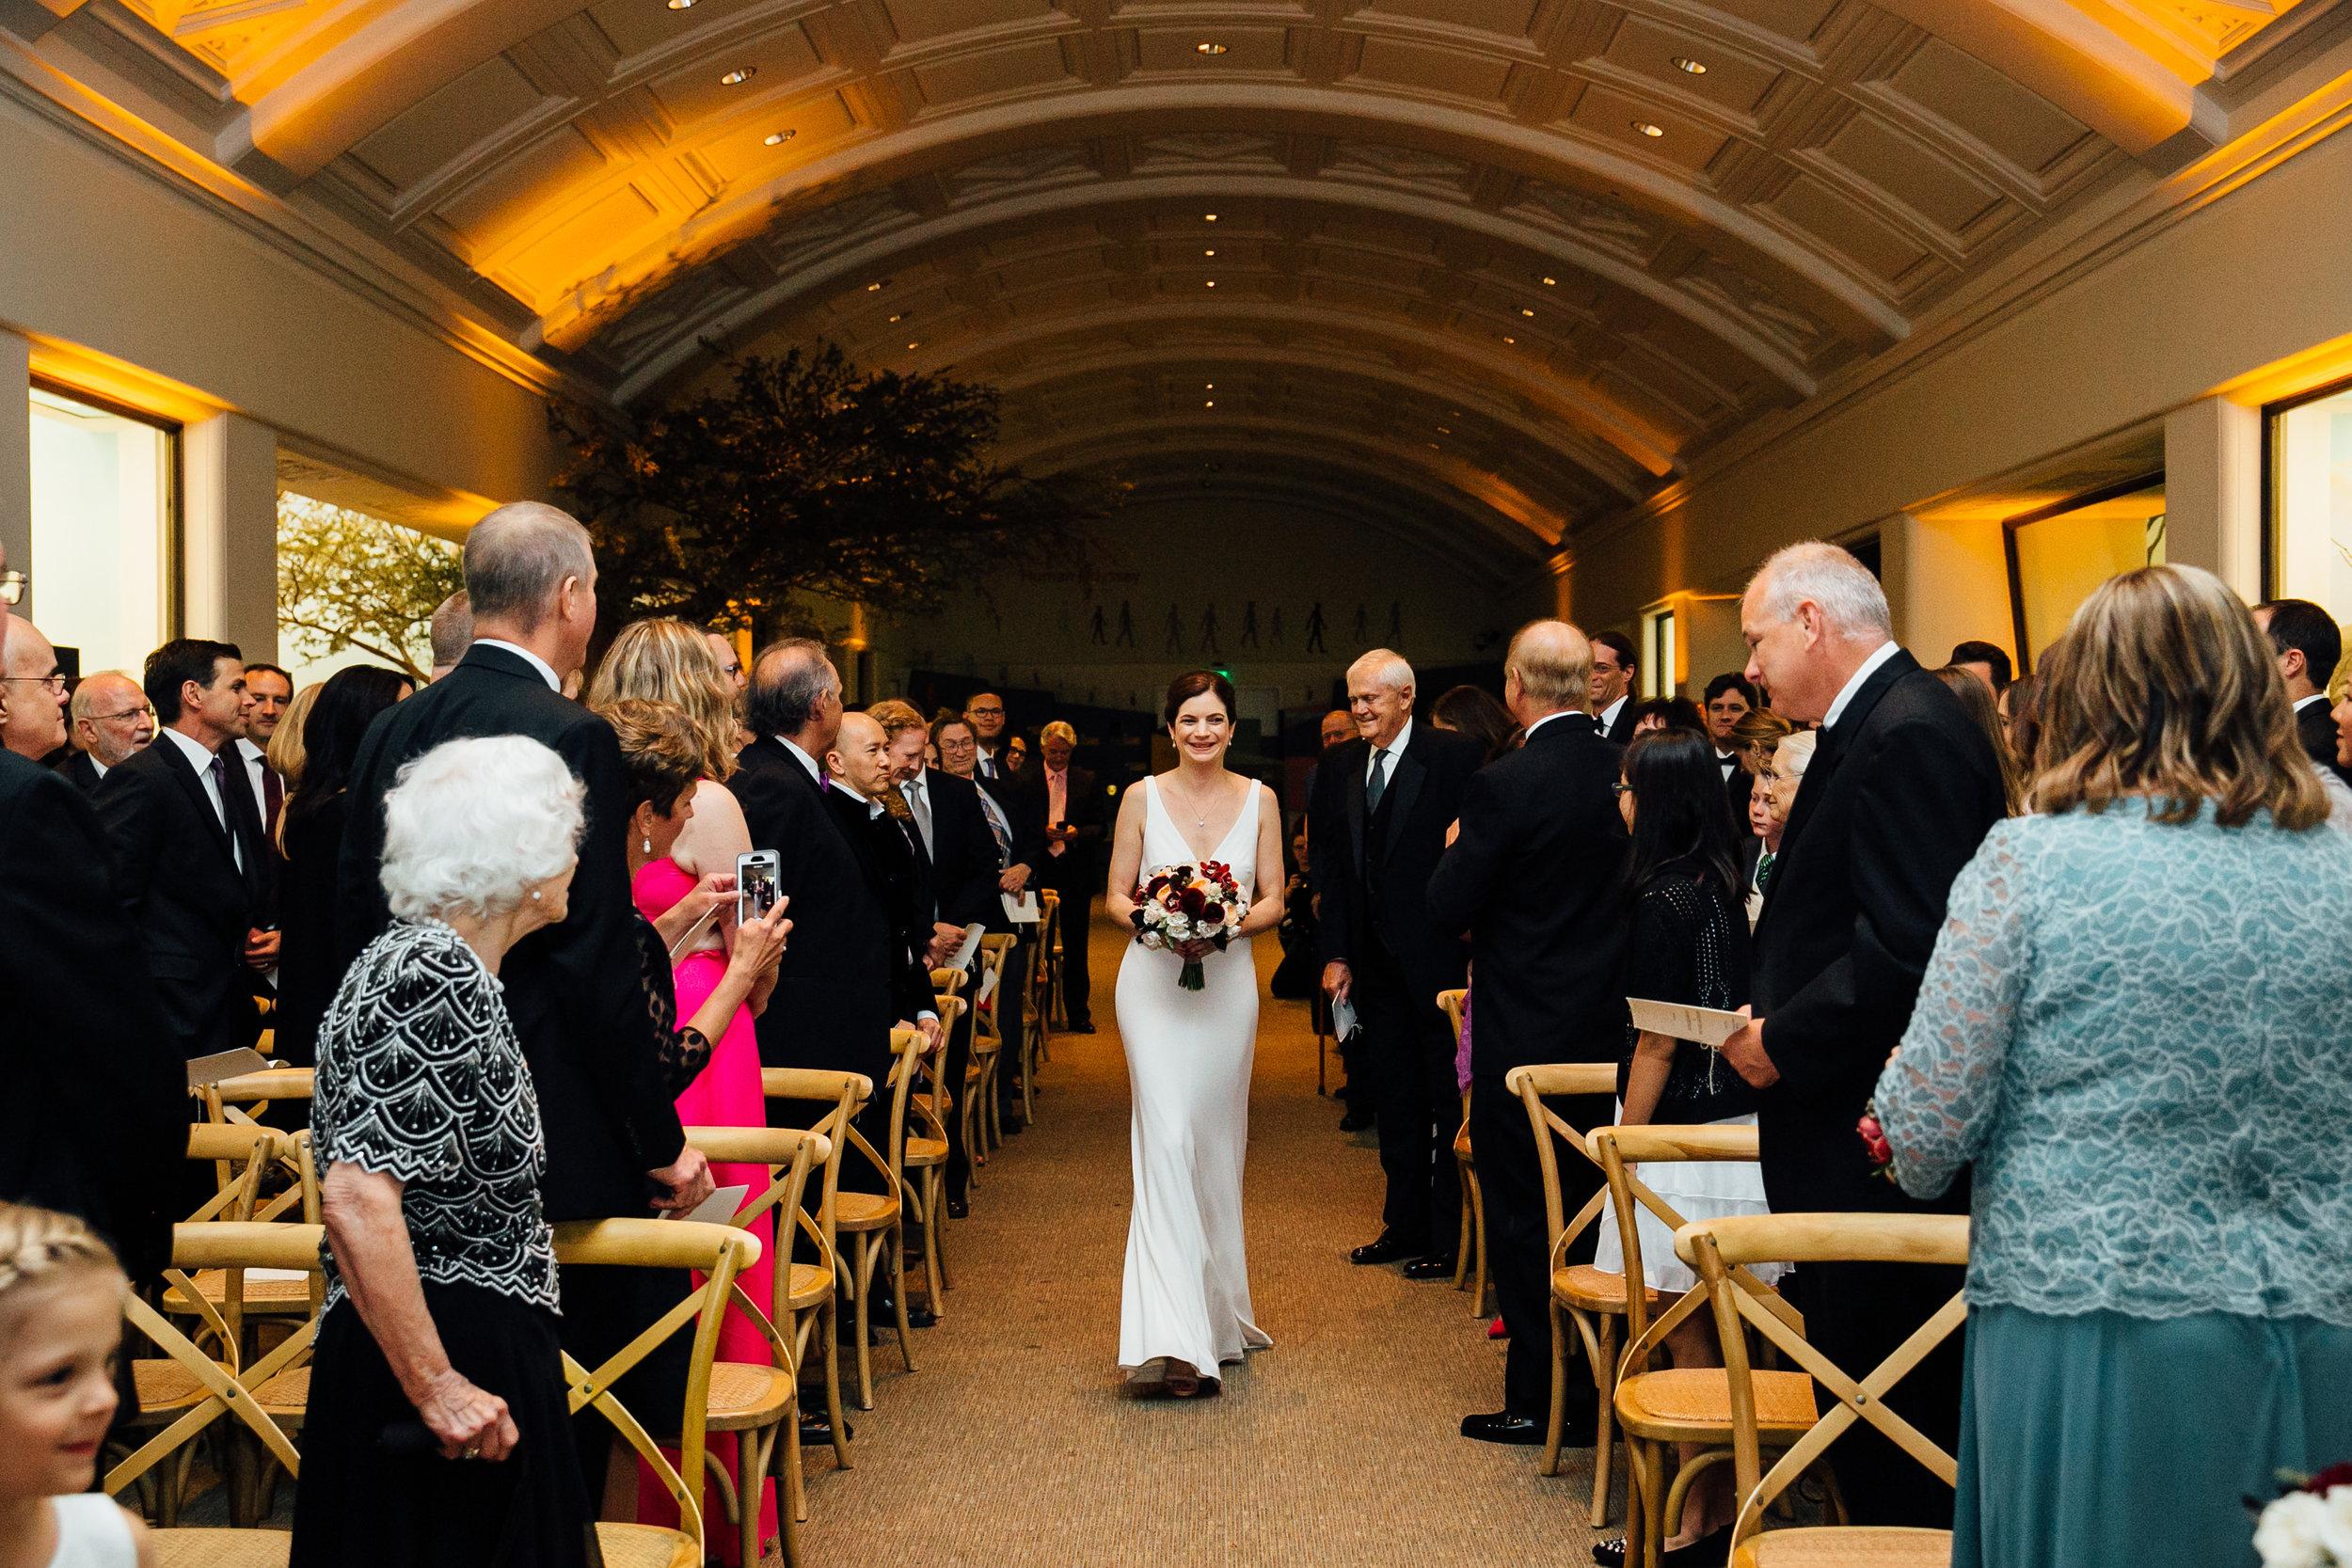 Wedding_KathleenMichael_Ceremony-163.jpg